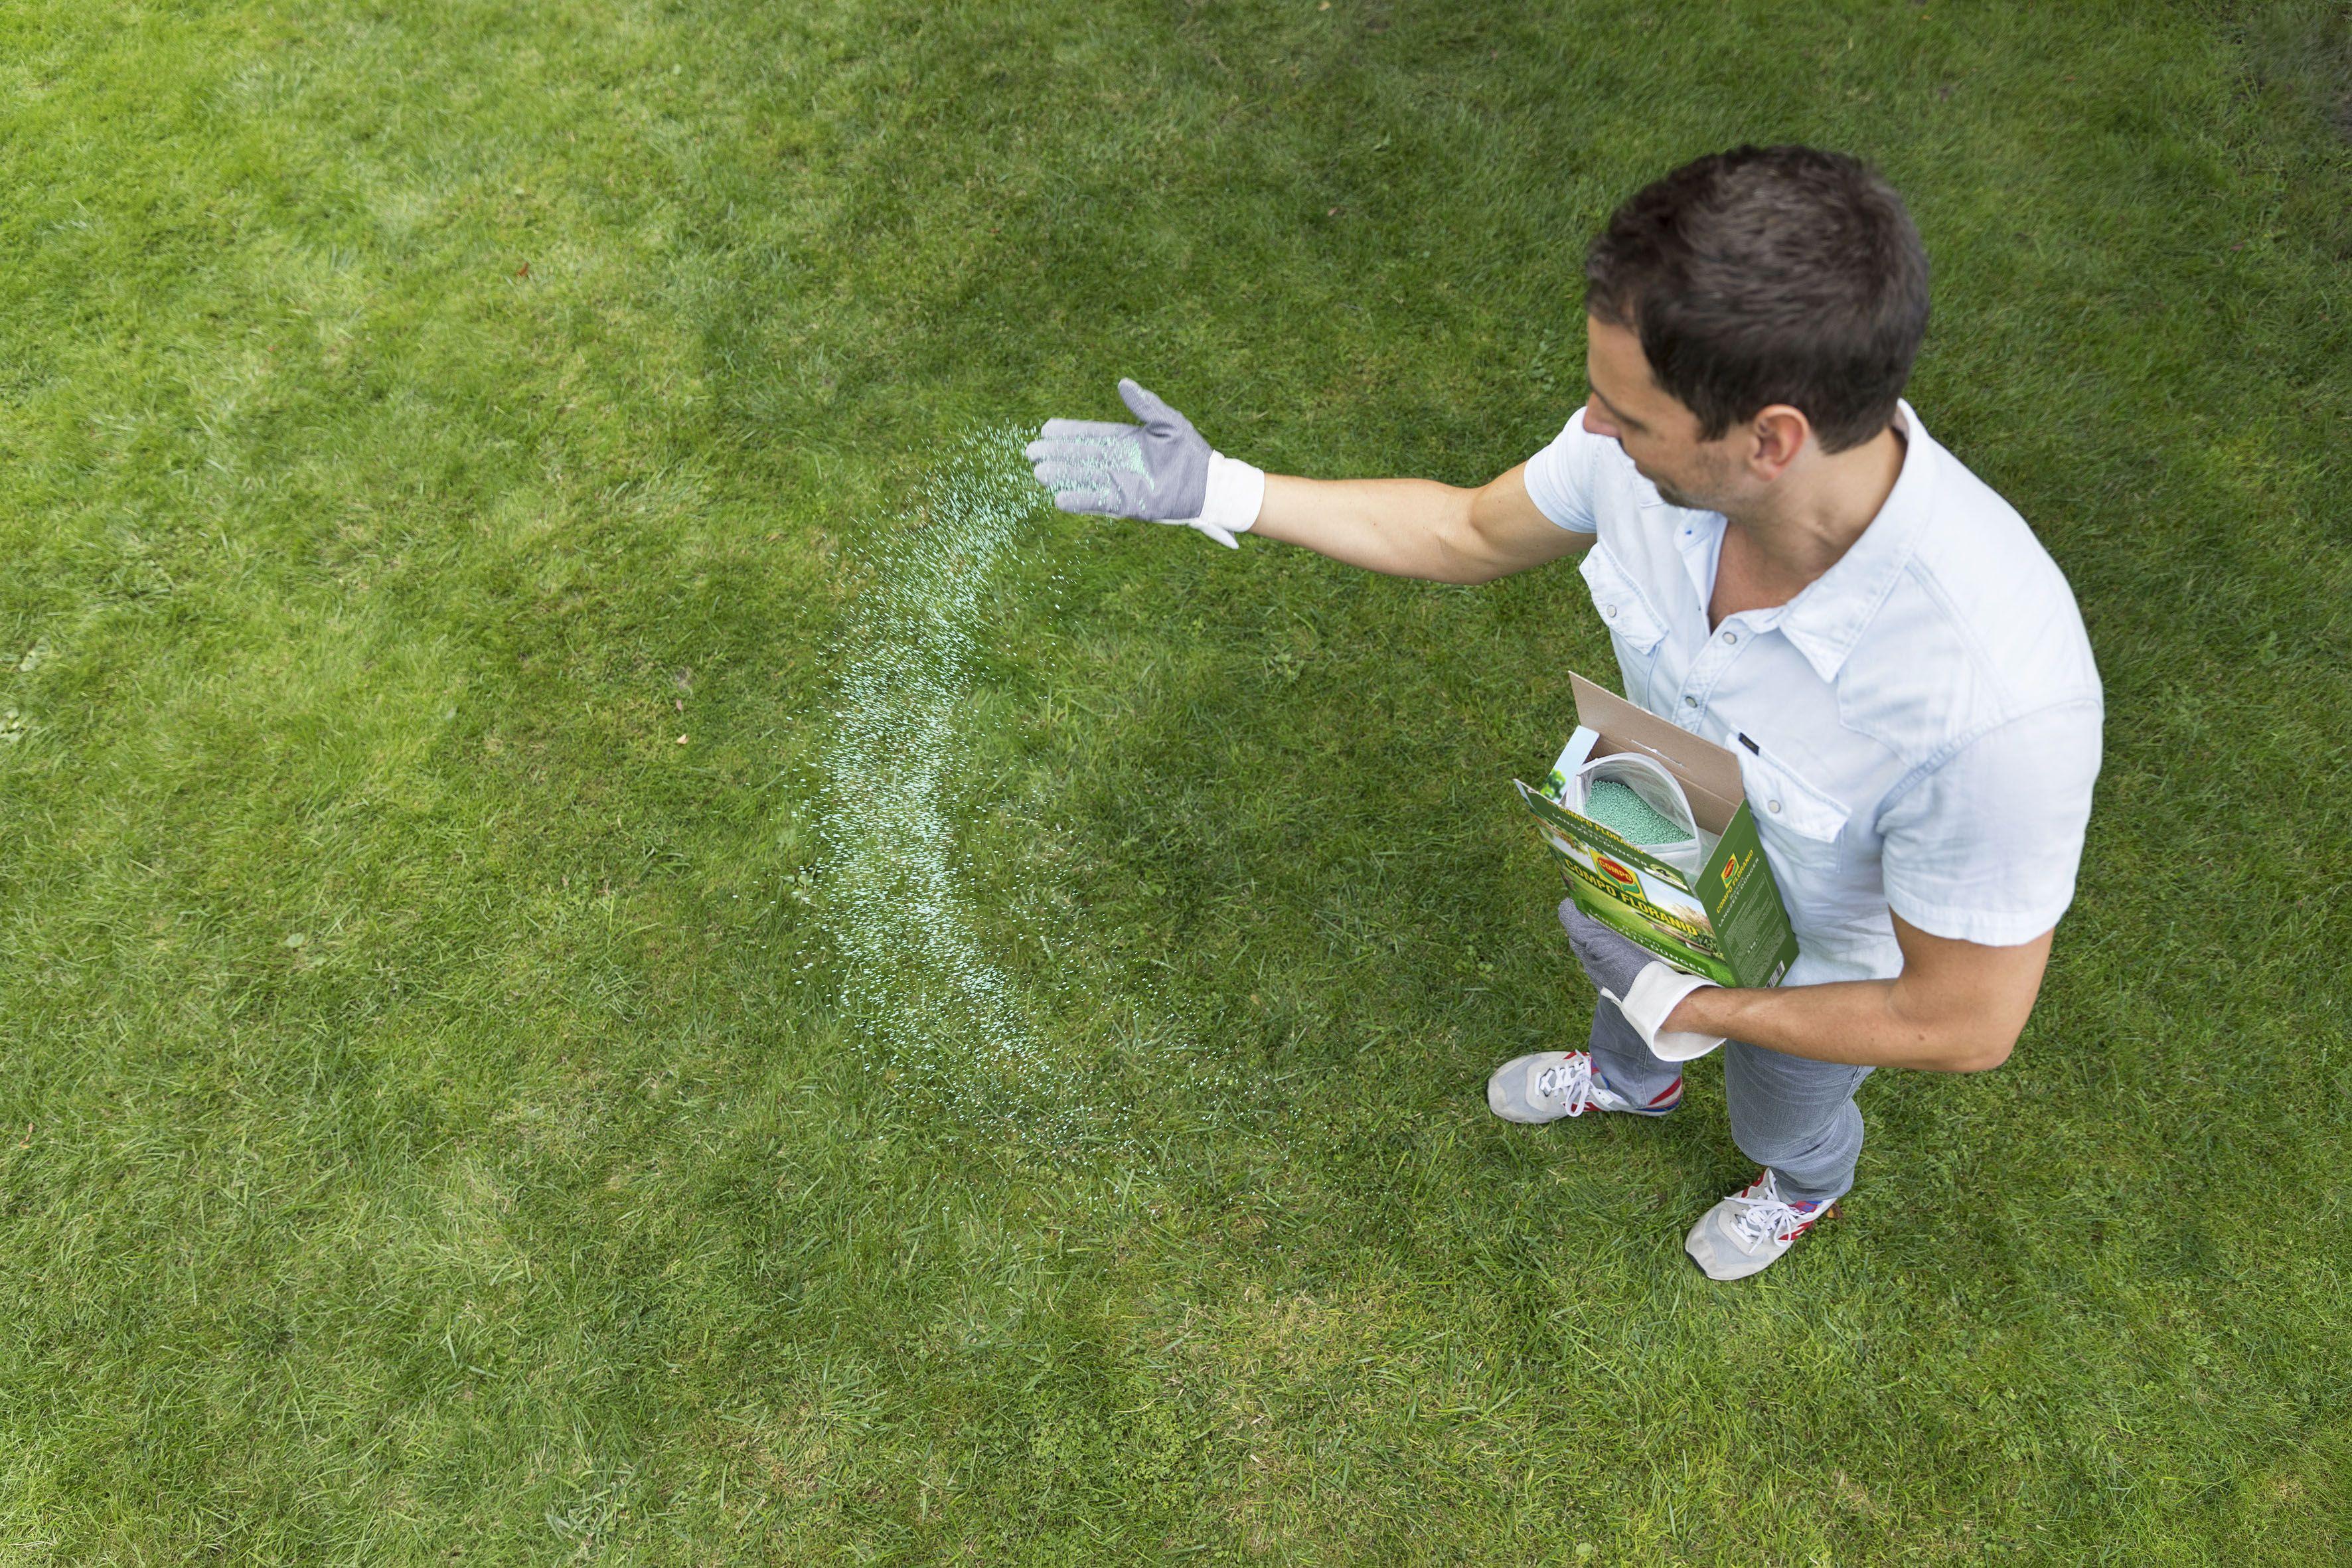 Moos Im Rasen Bekampfen Das Haus Rasenpflege Rasen Gruner Rasen